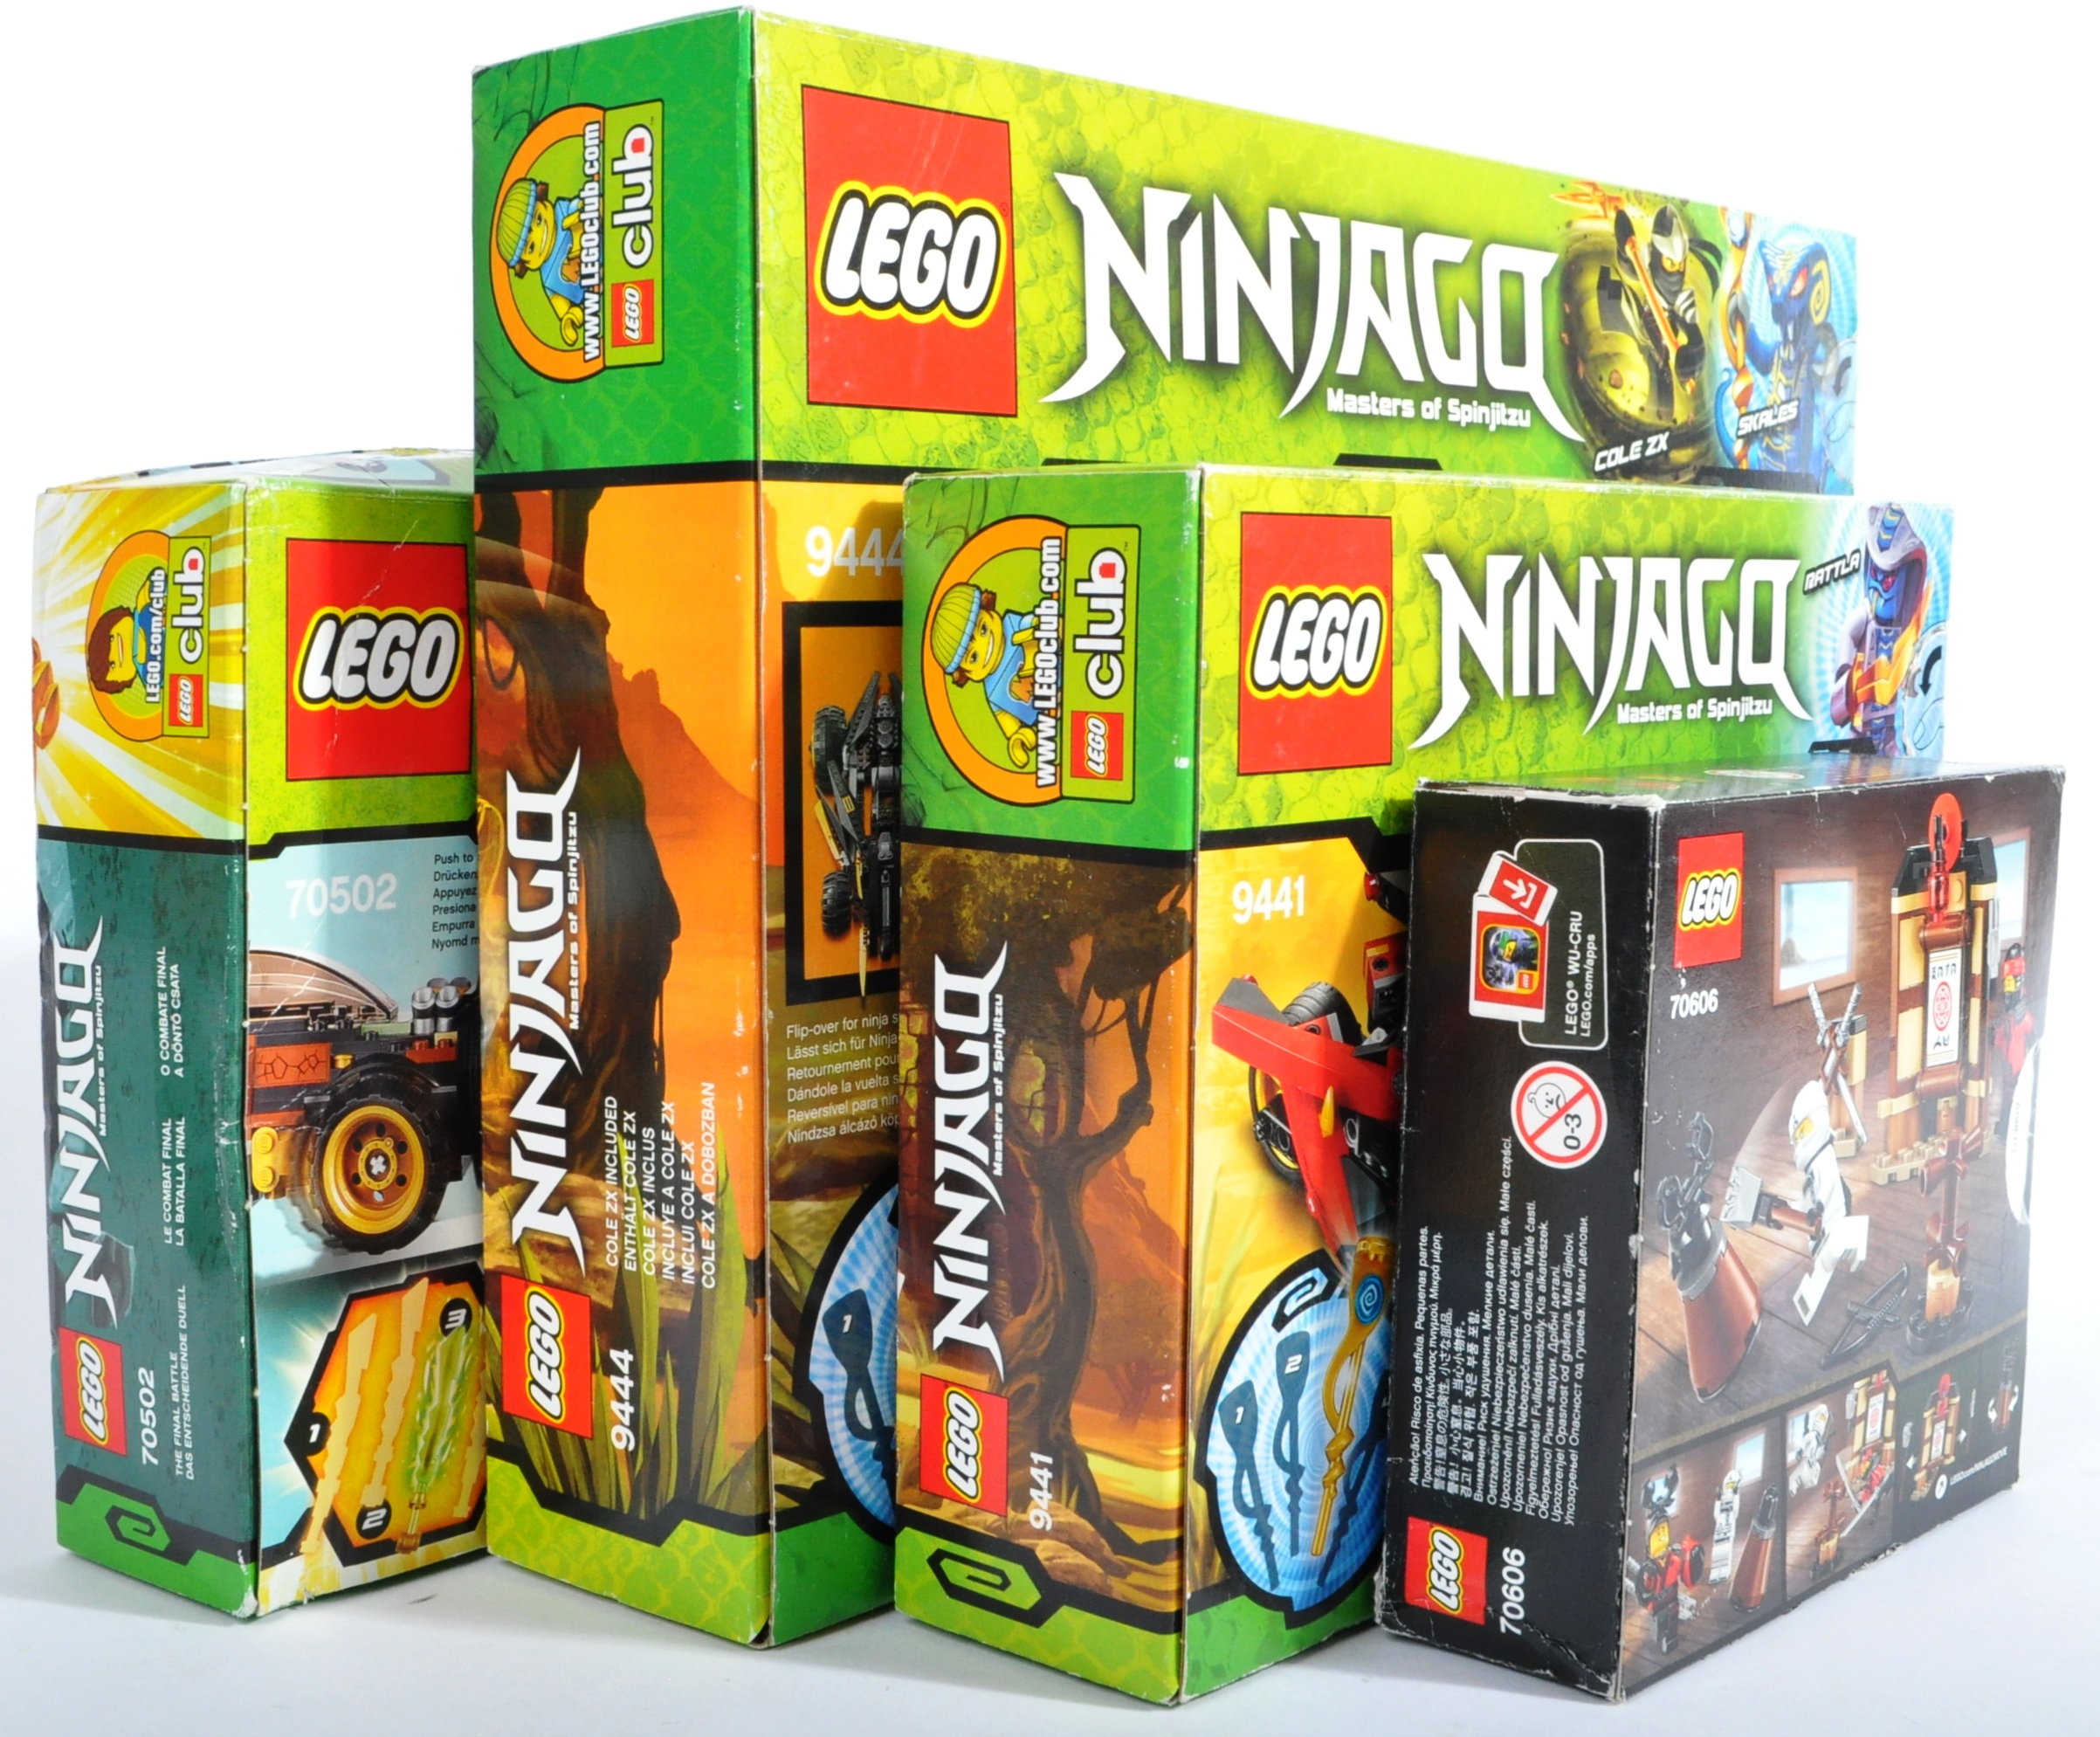 LEGO SETS - LEGO NINJAGO - 9441 / 70606 / 70502 / 9444 - Image 3 of 4